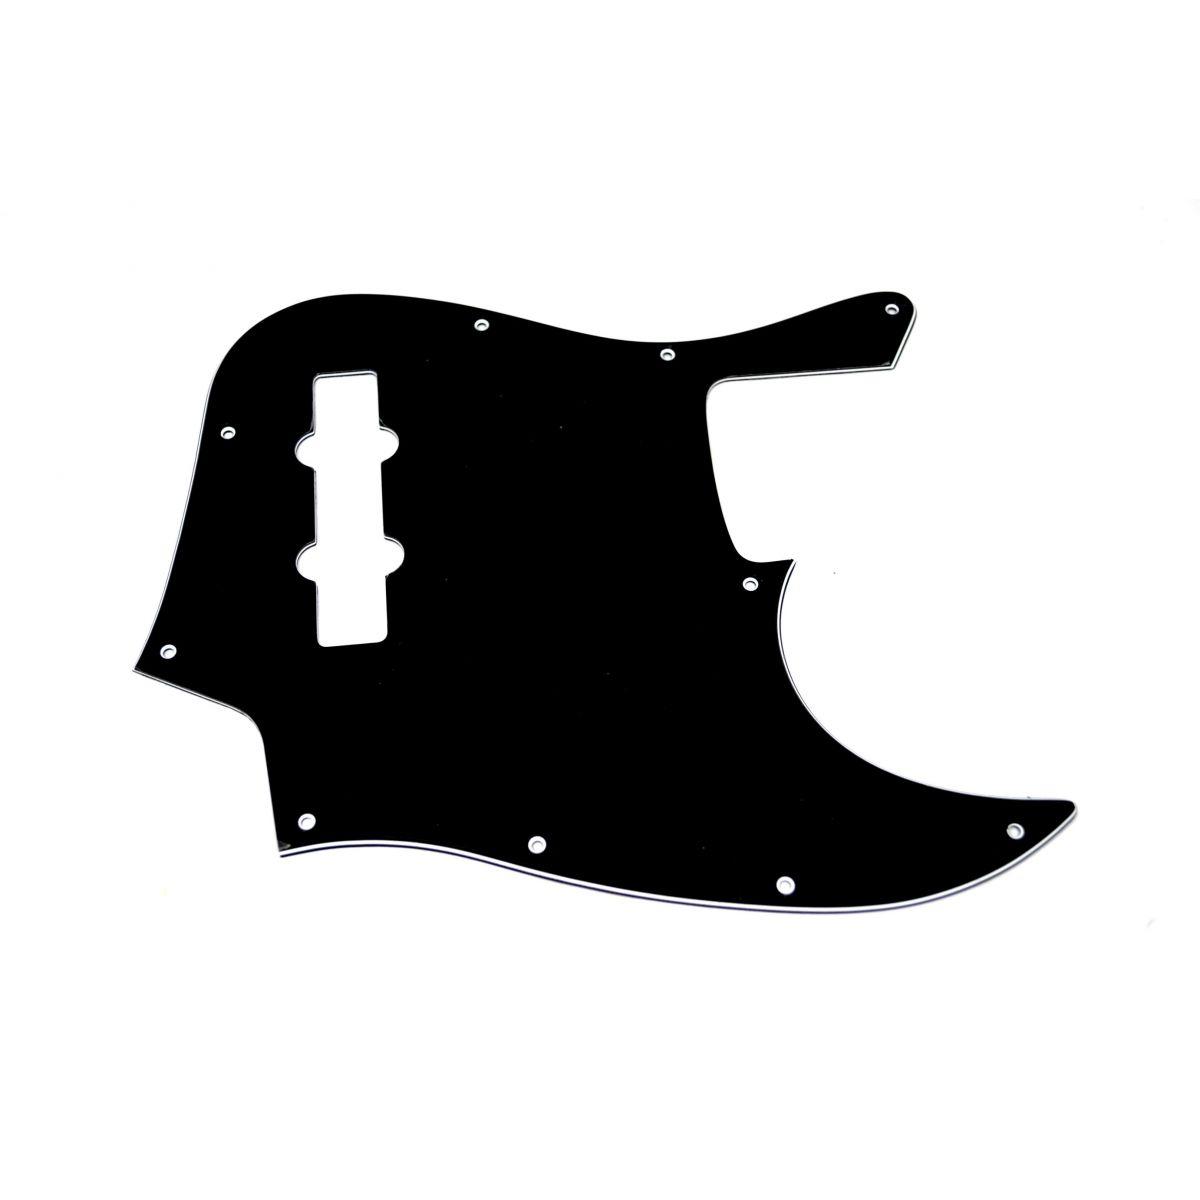 Escudo para Baixo Jazz Bass Preto - 3 camadas (sanduíche) - Spirit (X641)  - Luthieria Brasil